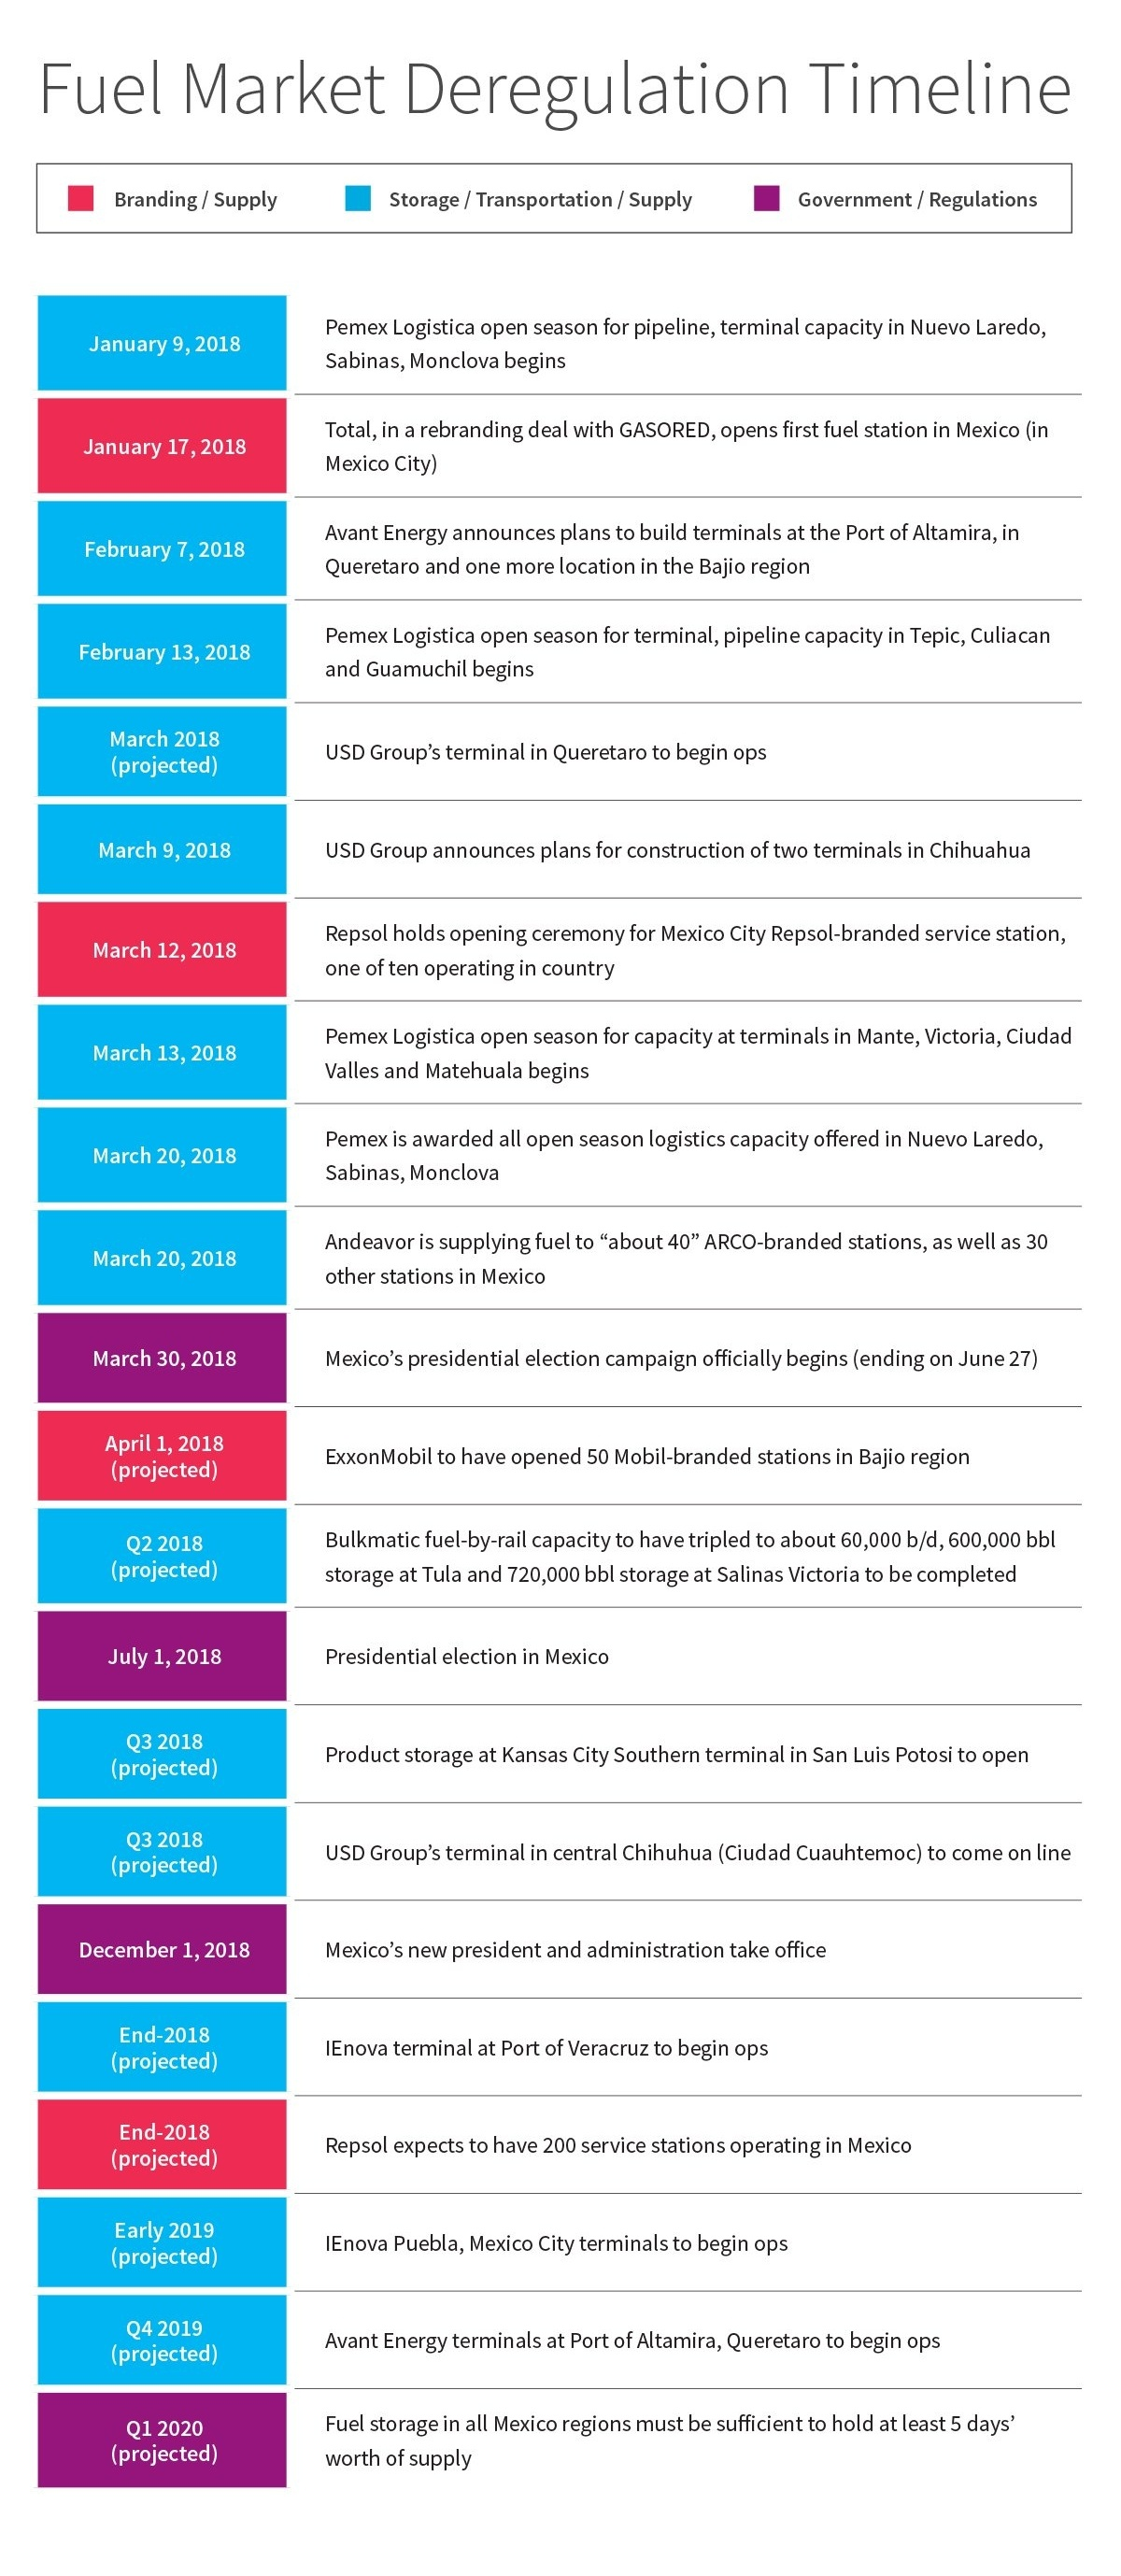 Mexican Fuel Market Timeline 2018